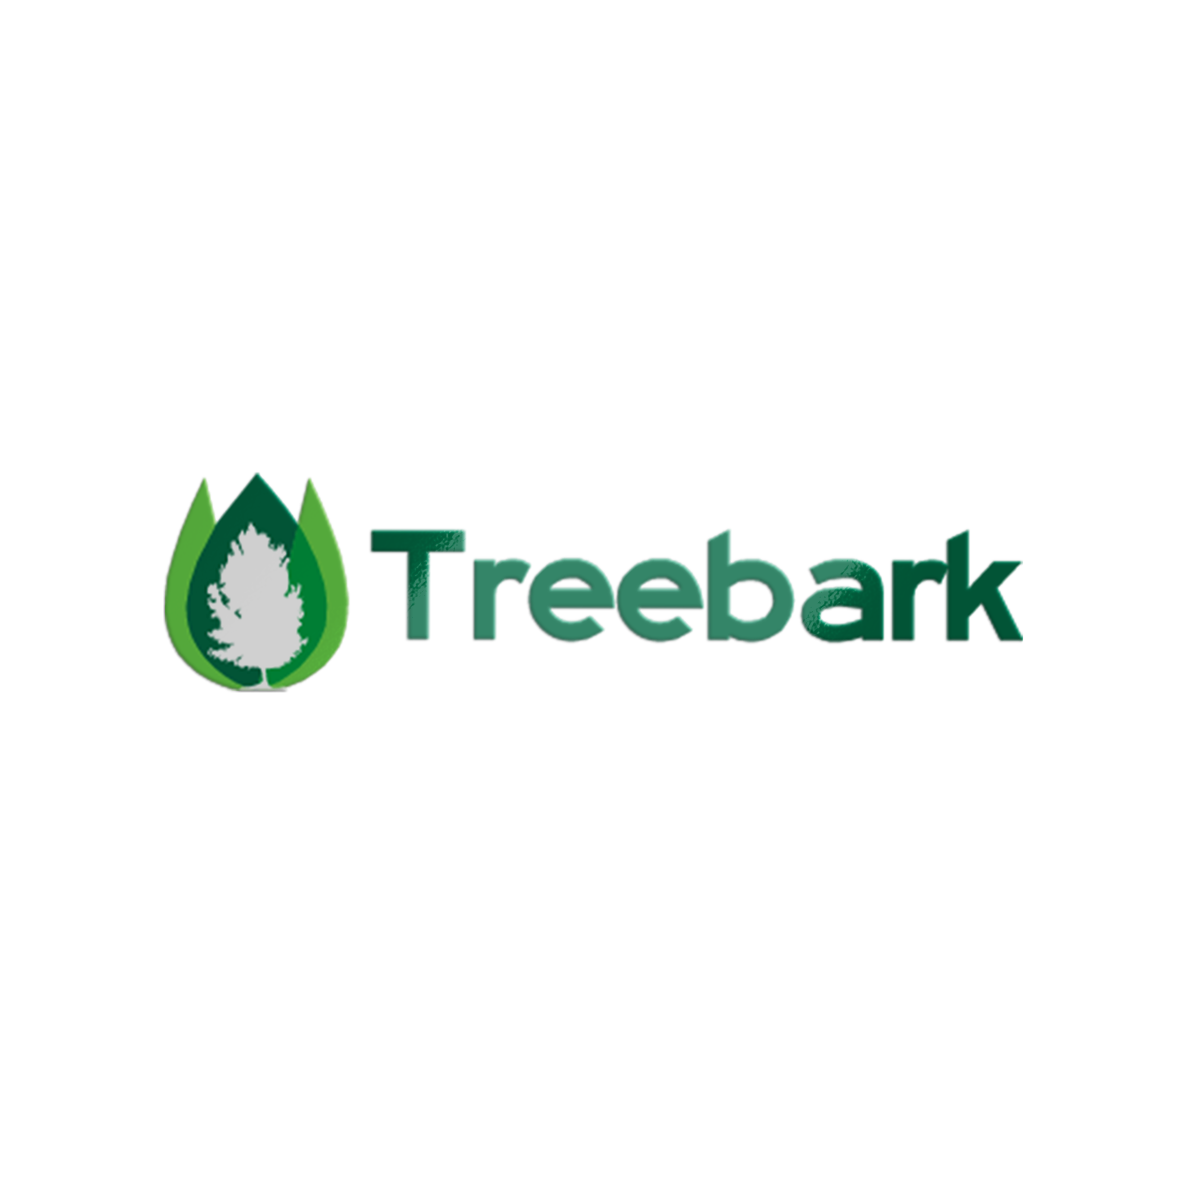 Treebark Termite and Pest Control - Anaheim, CA - Pest & Animal Control